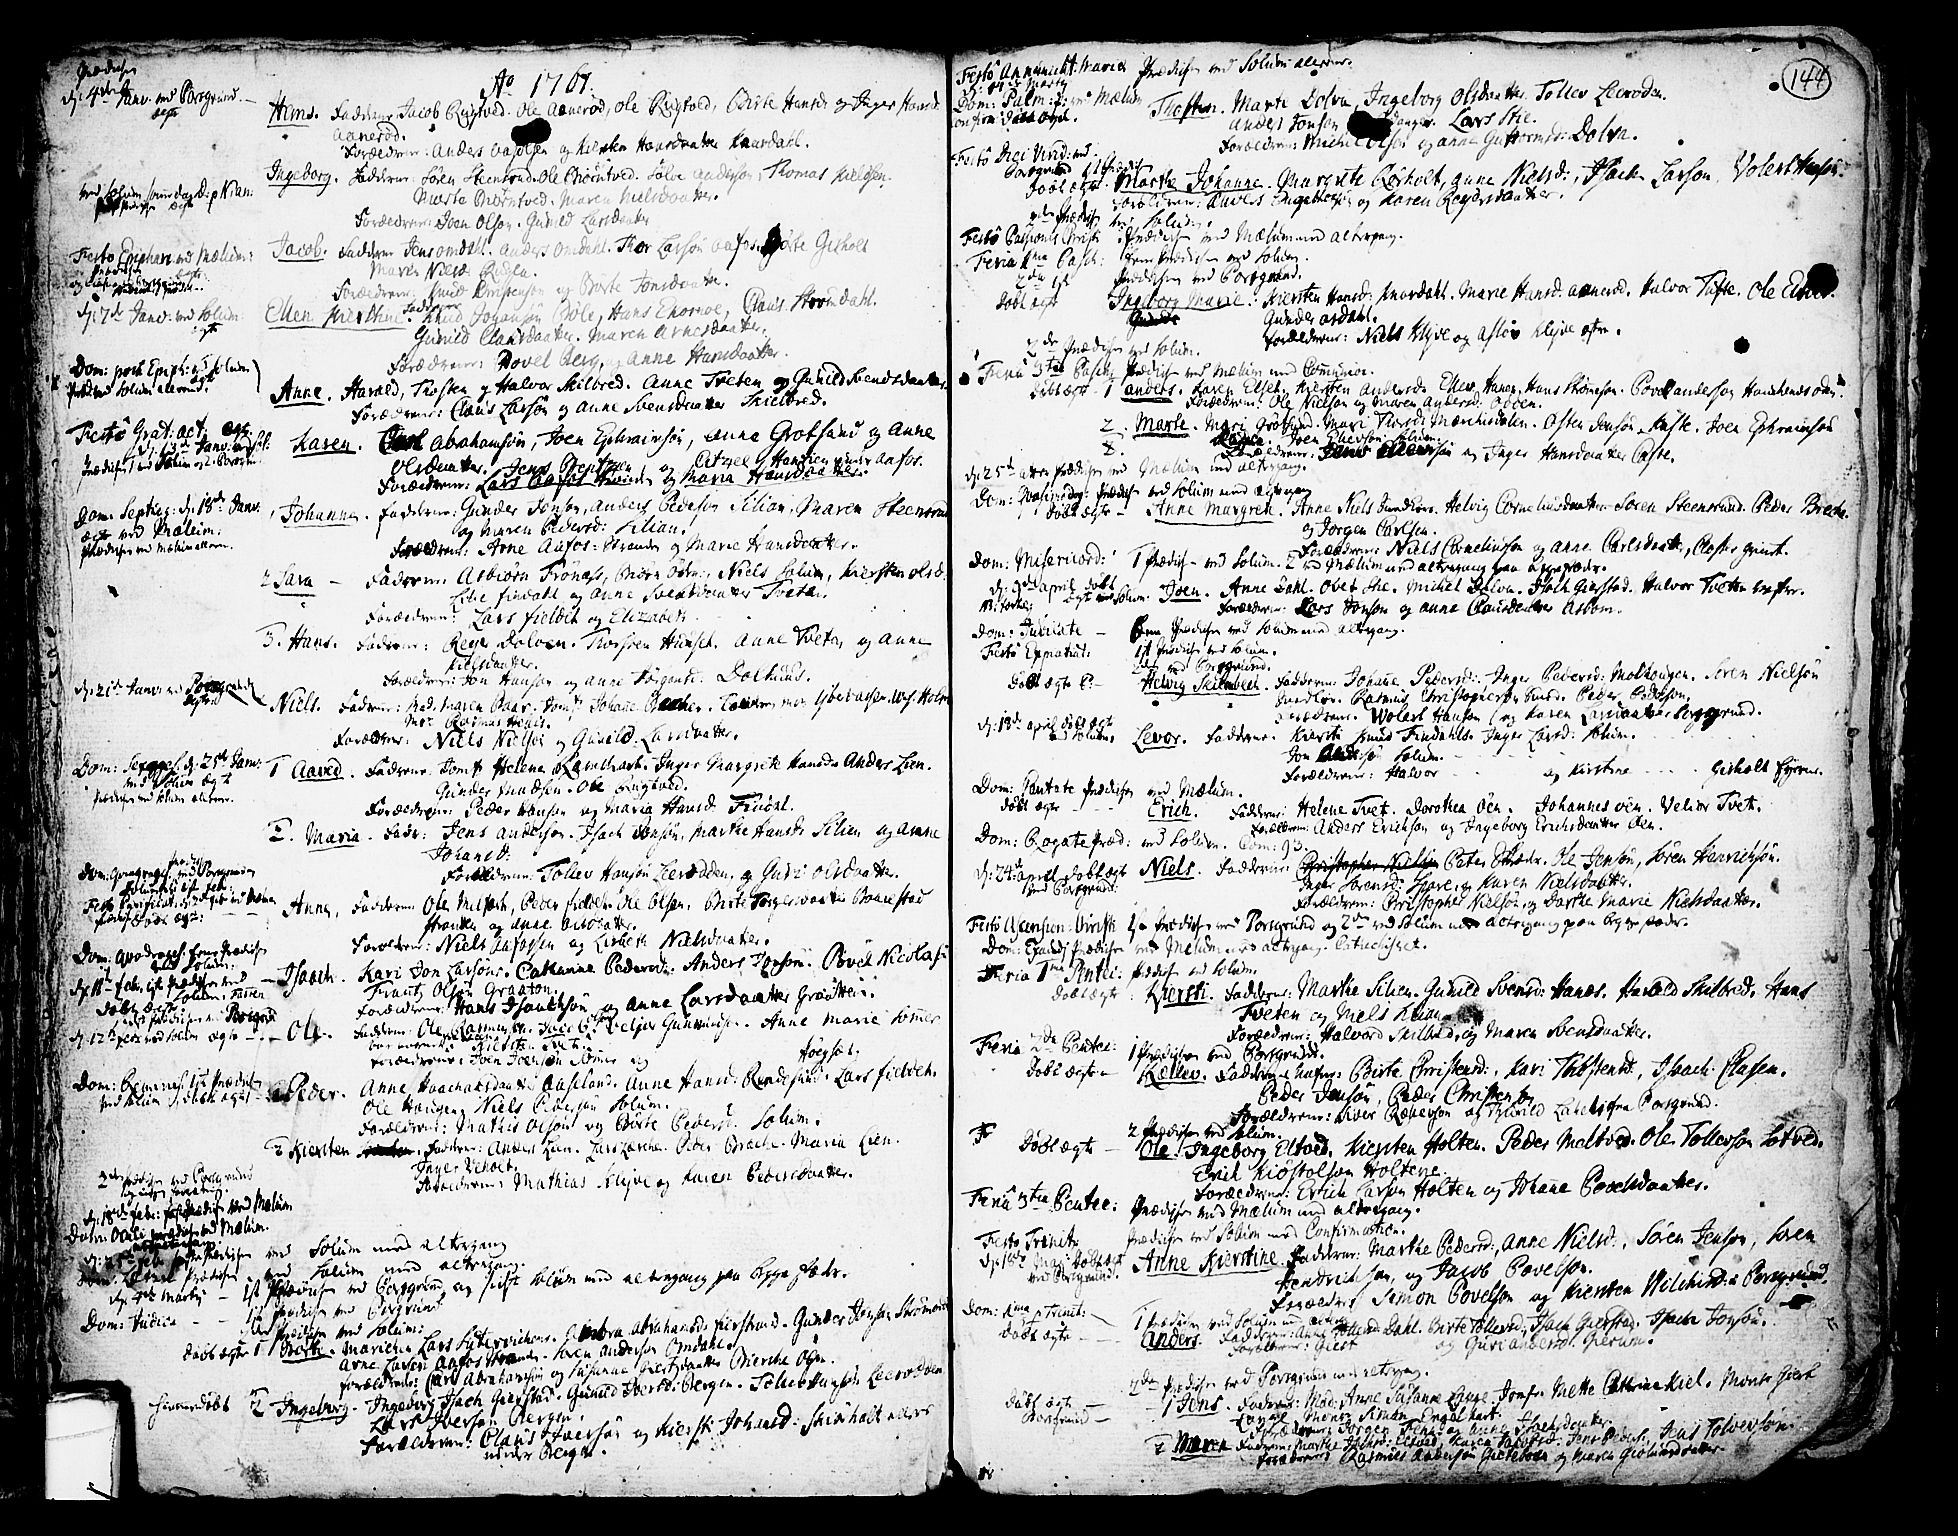 SAKO, Solum kirkebøker, F/Fa/L0002: Ministerialbok nr. I 2, 1713-1761, s. 144